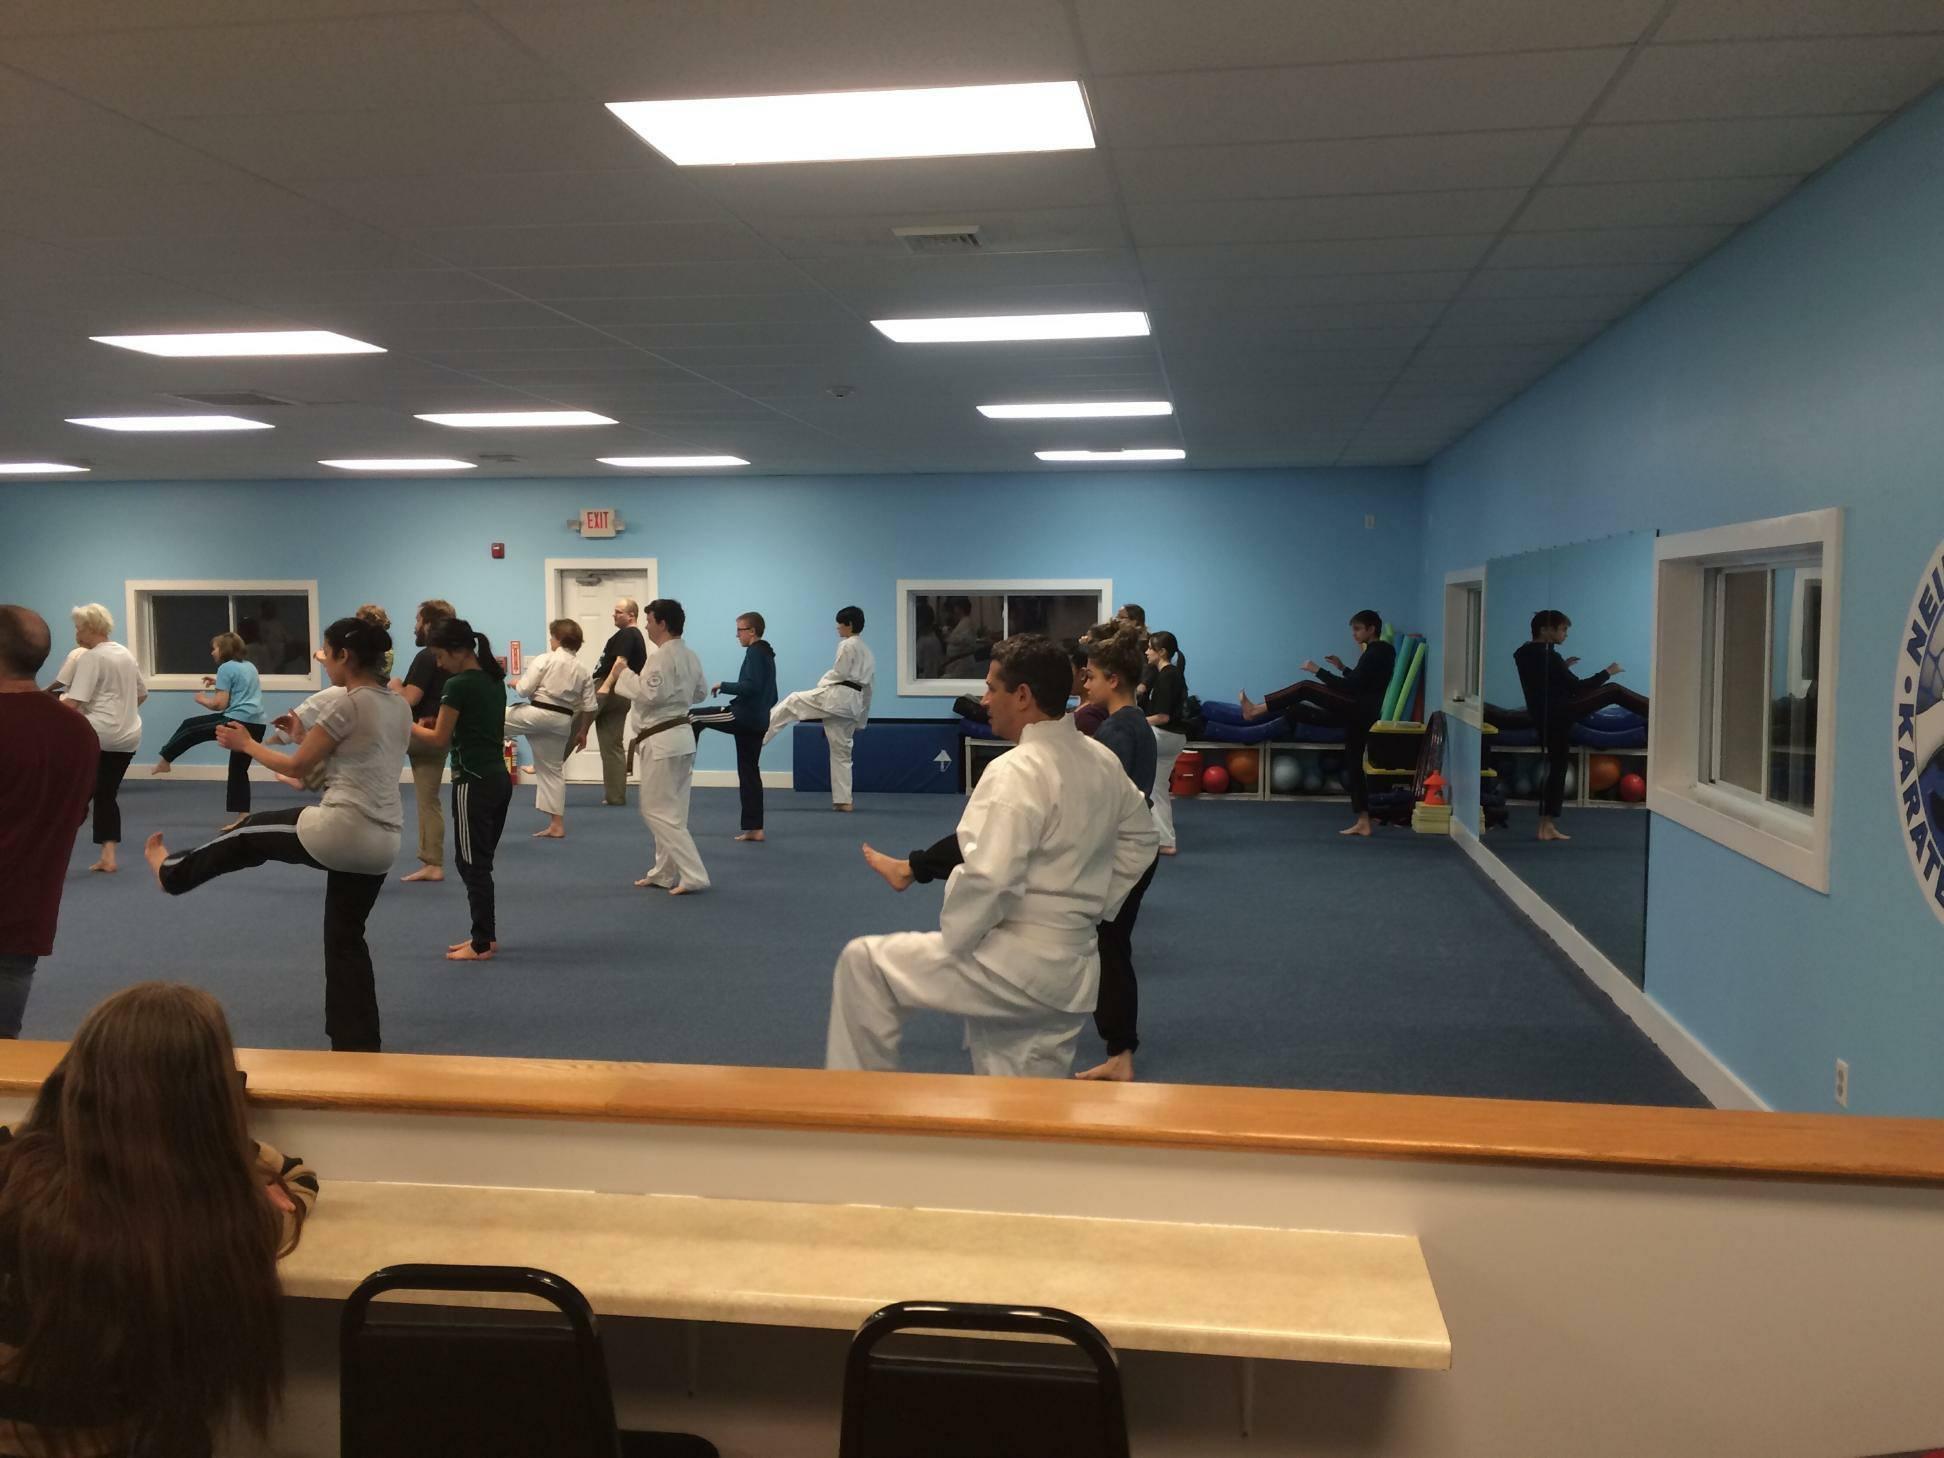 Classroom at Neil Stone's Karate Academy